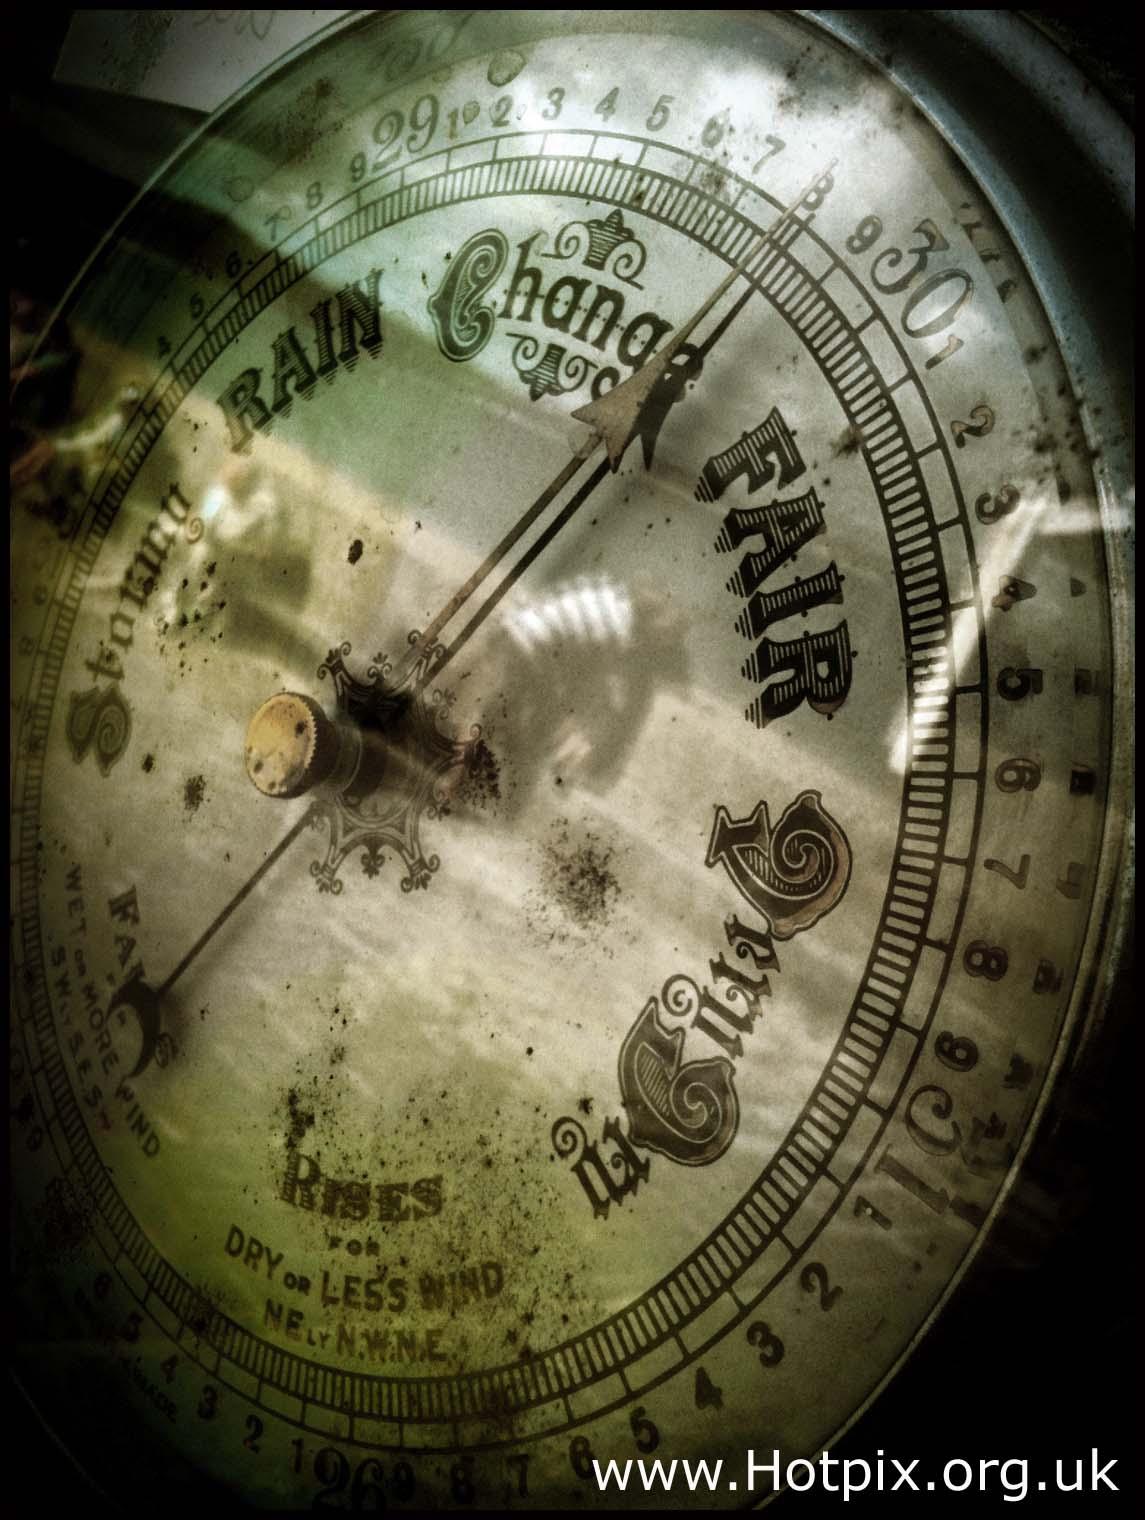 bbc,weather,uk,rain,gale,snow,pub quiz,sepia,selective,colour,b/w,black,white,tonysmith,hotpix,tony,smith,air,pressure,barometer,instrument,temperature,HDR,aneroid